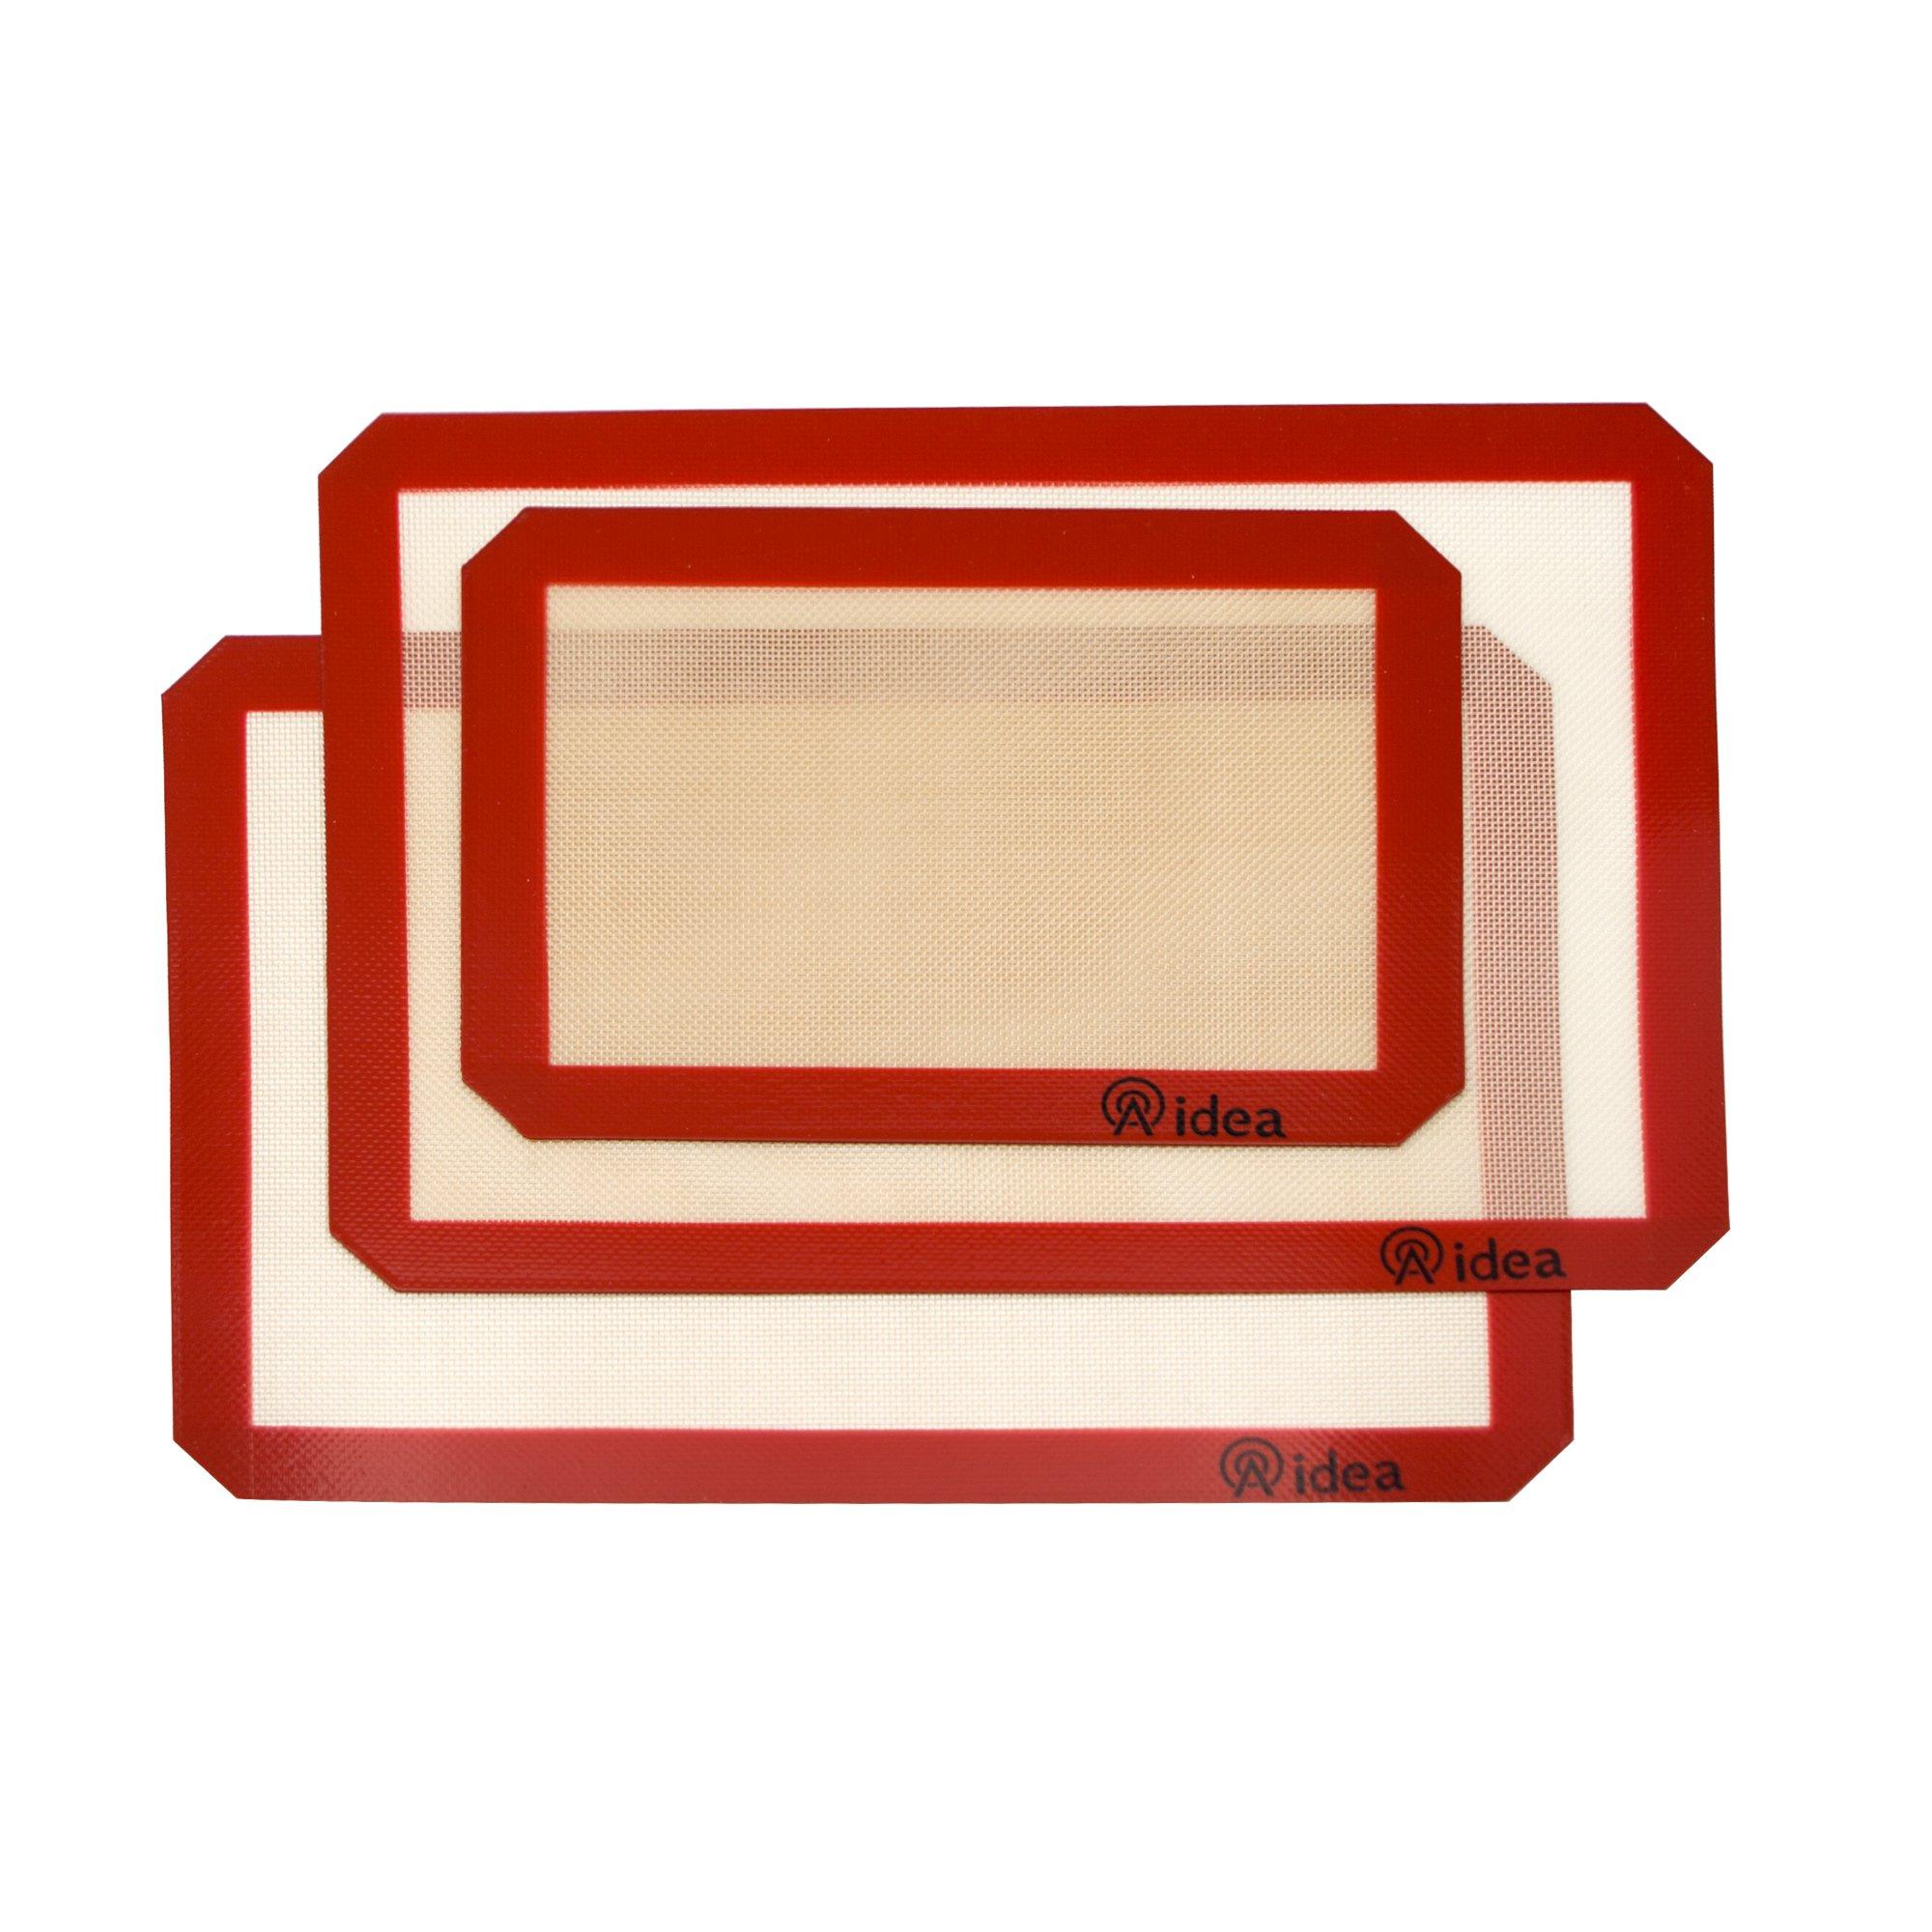 Silicone Baking Mat - Nonstick Rolling Baking Sheet Cookie Mat Fiberglass - Set of 3, 11-5/8'' x 16-1/2'' & 8-1/4'' x 11-3/4''